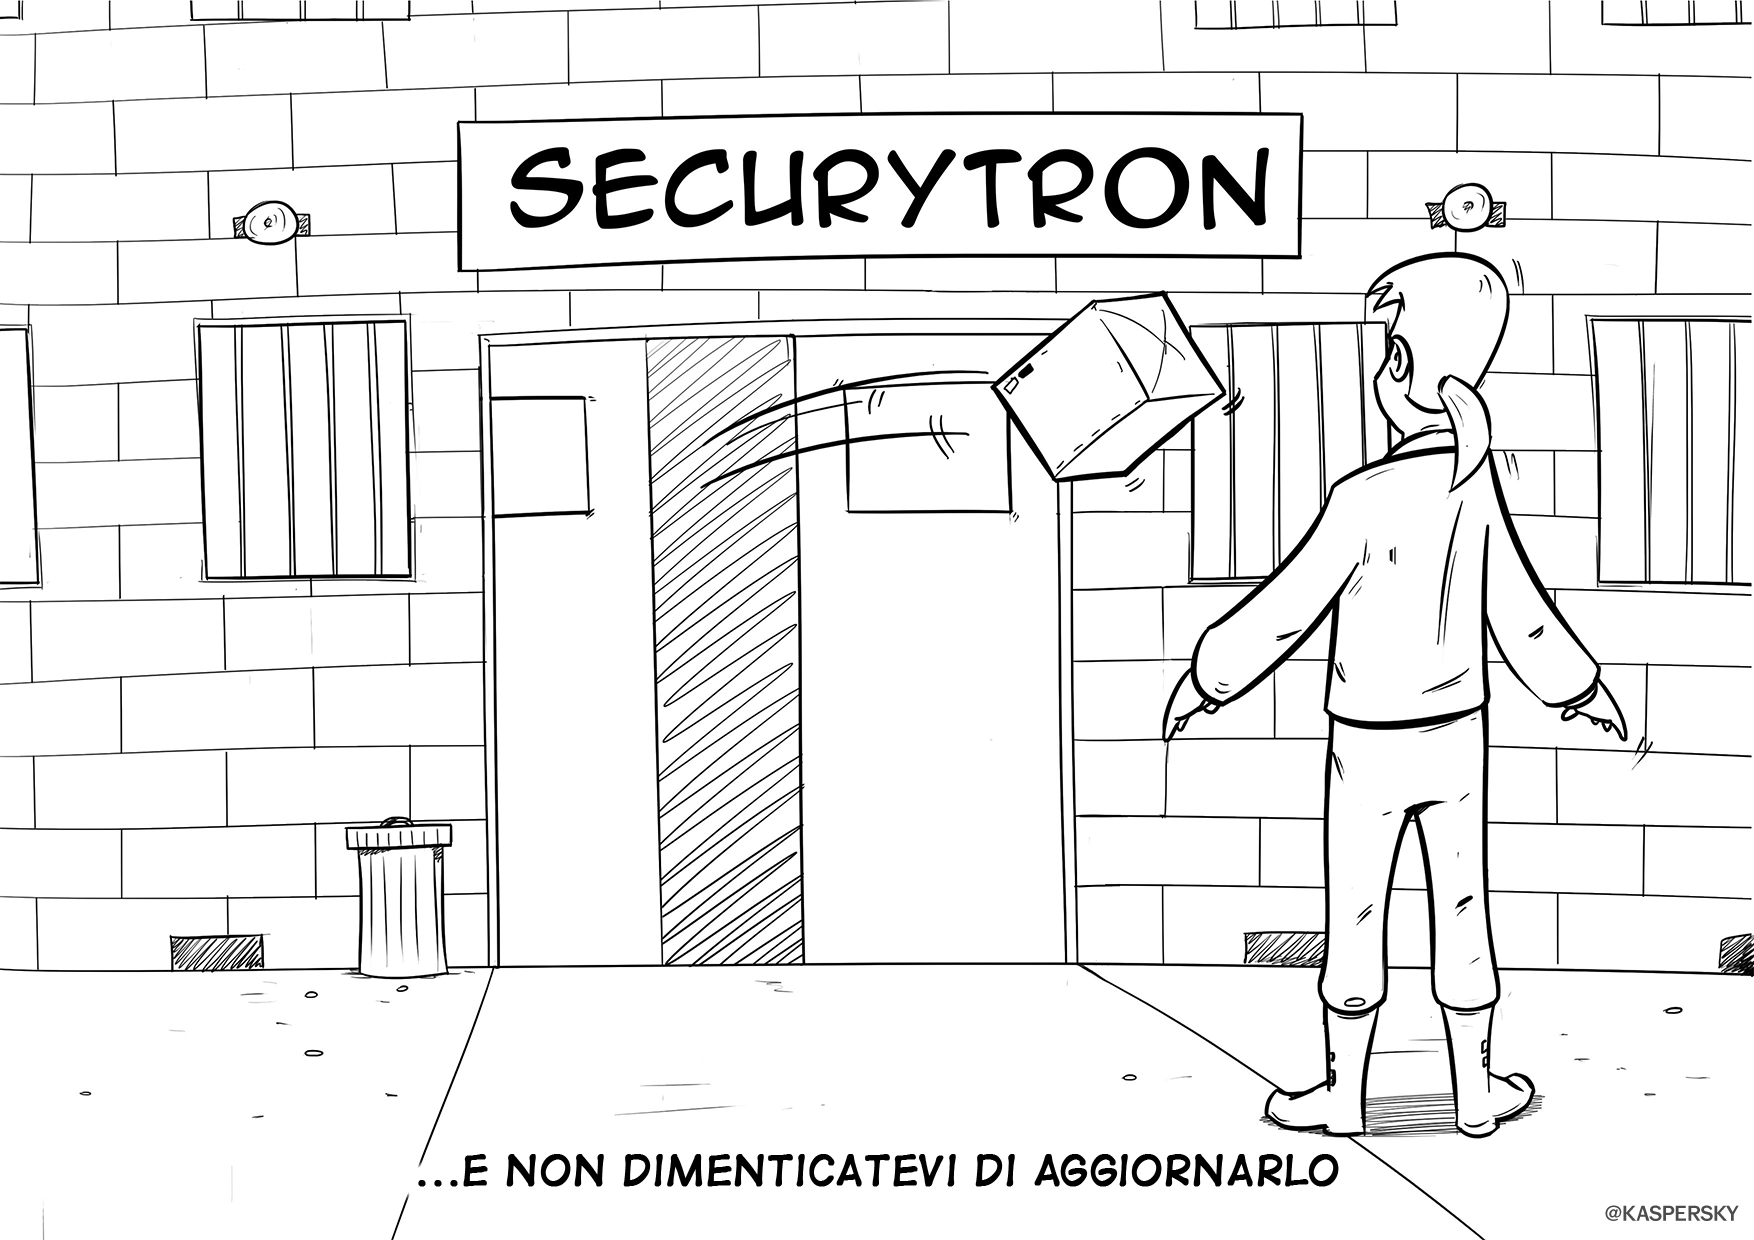 security tron 2_IT